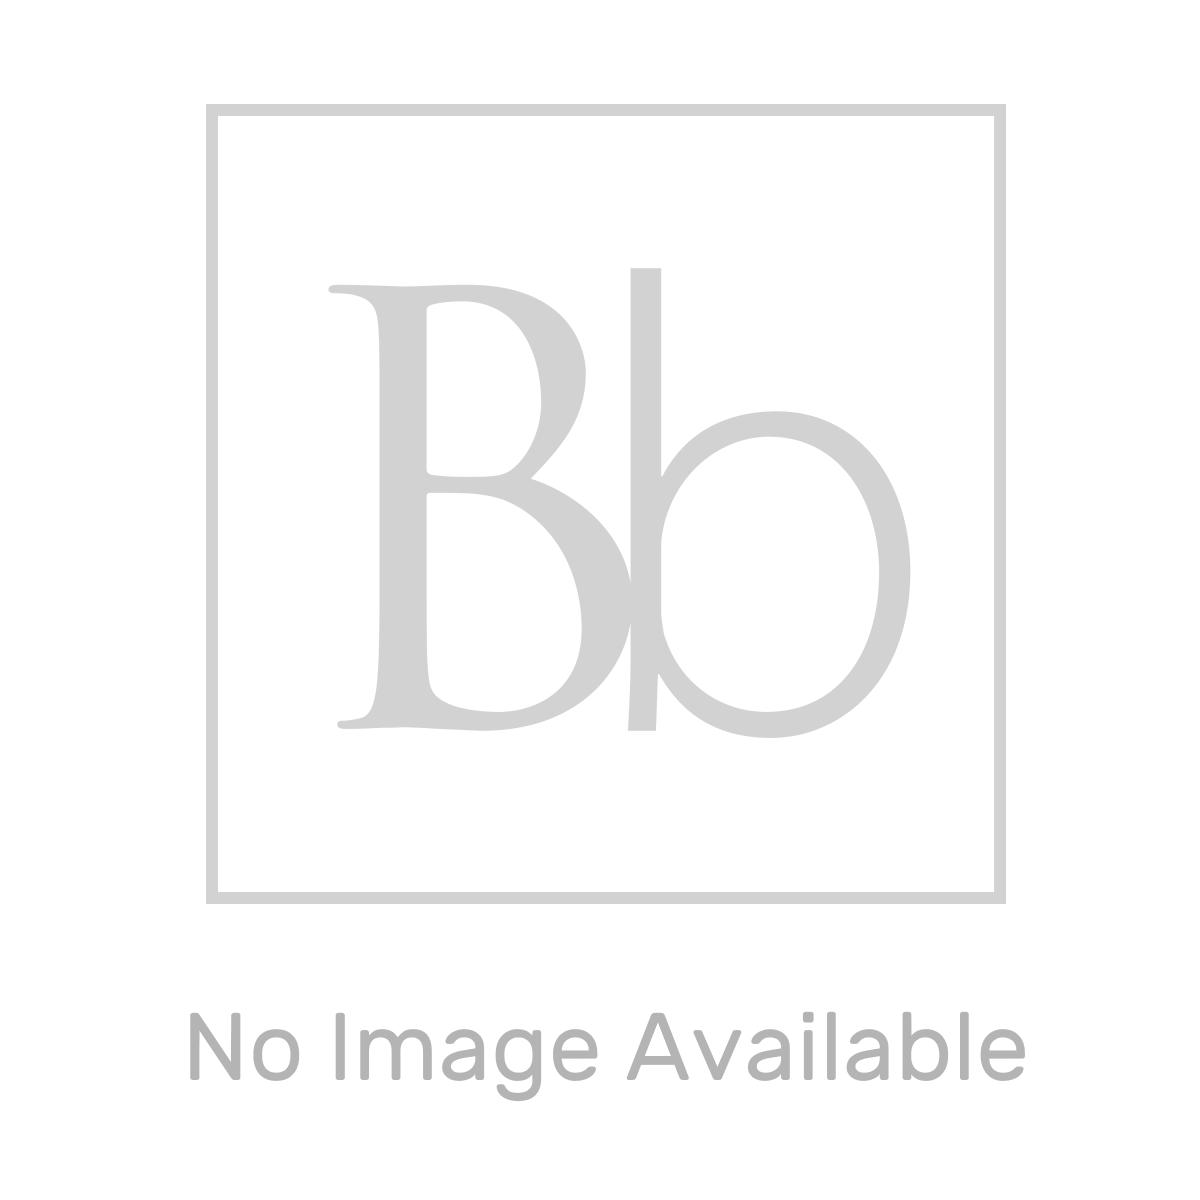 Aquadart Grey Slate Shower Tray 1200 x 900 Overhead